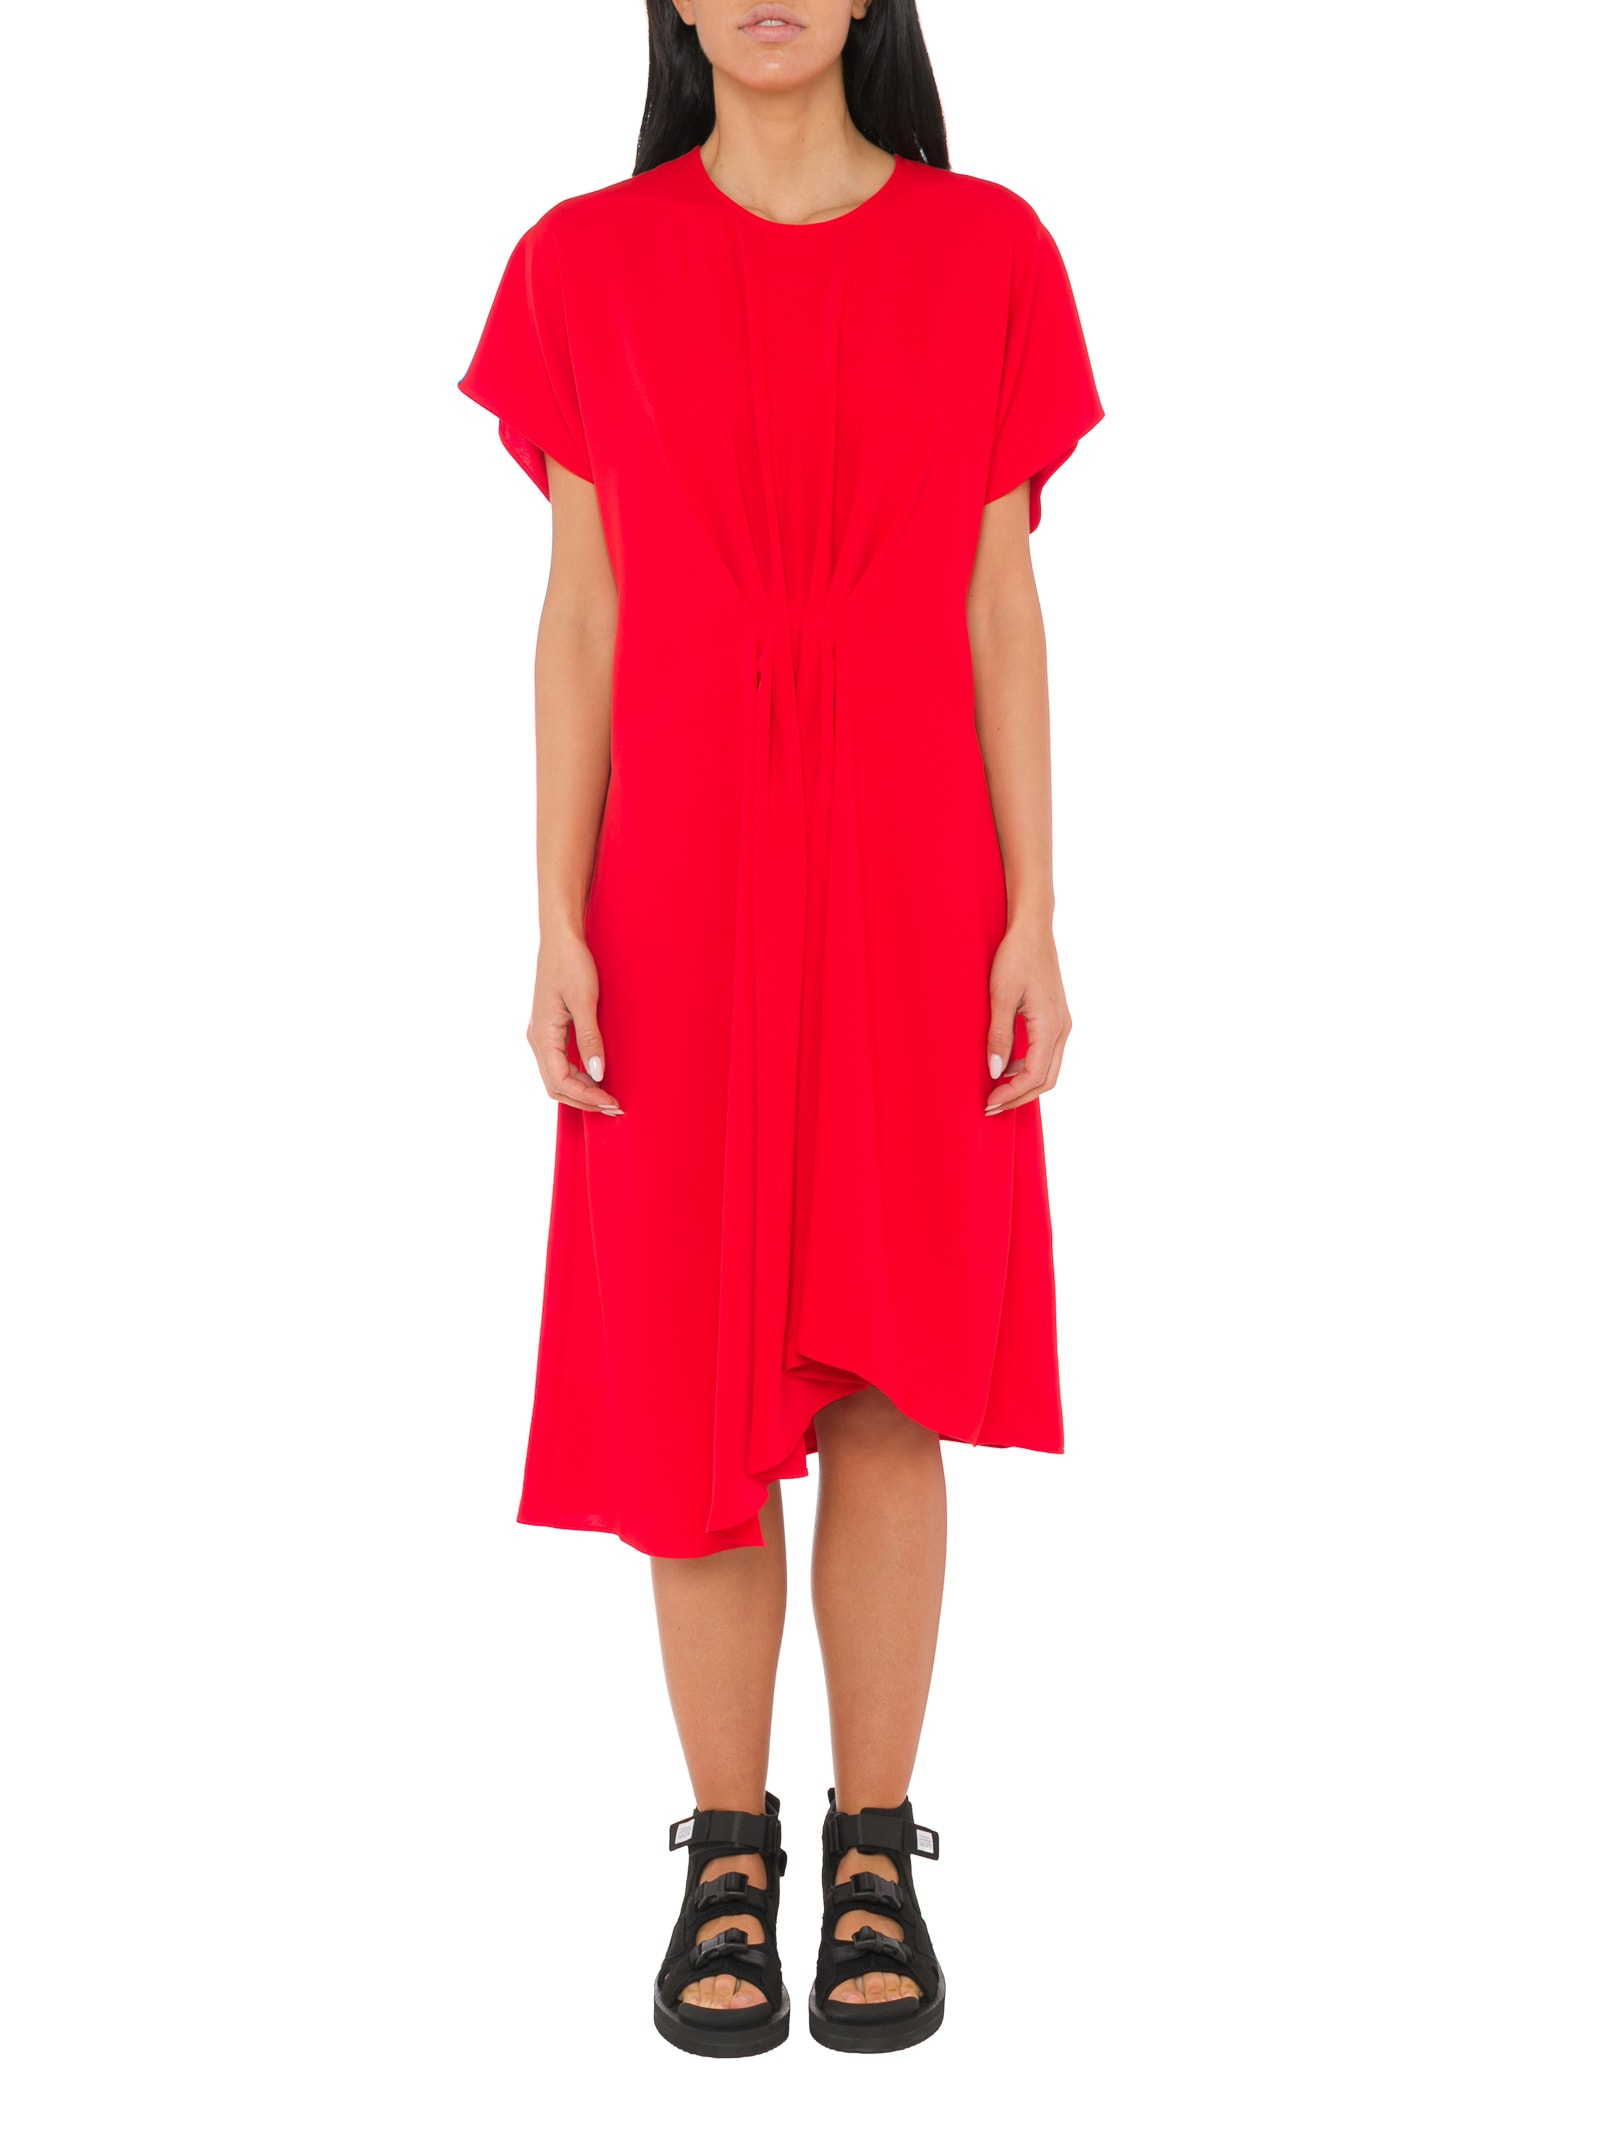 Kenzo Draped Dress